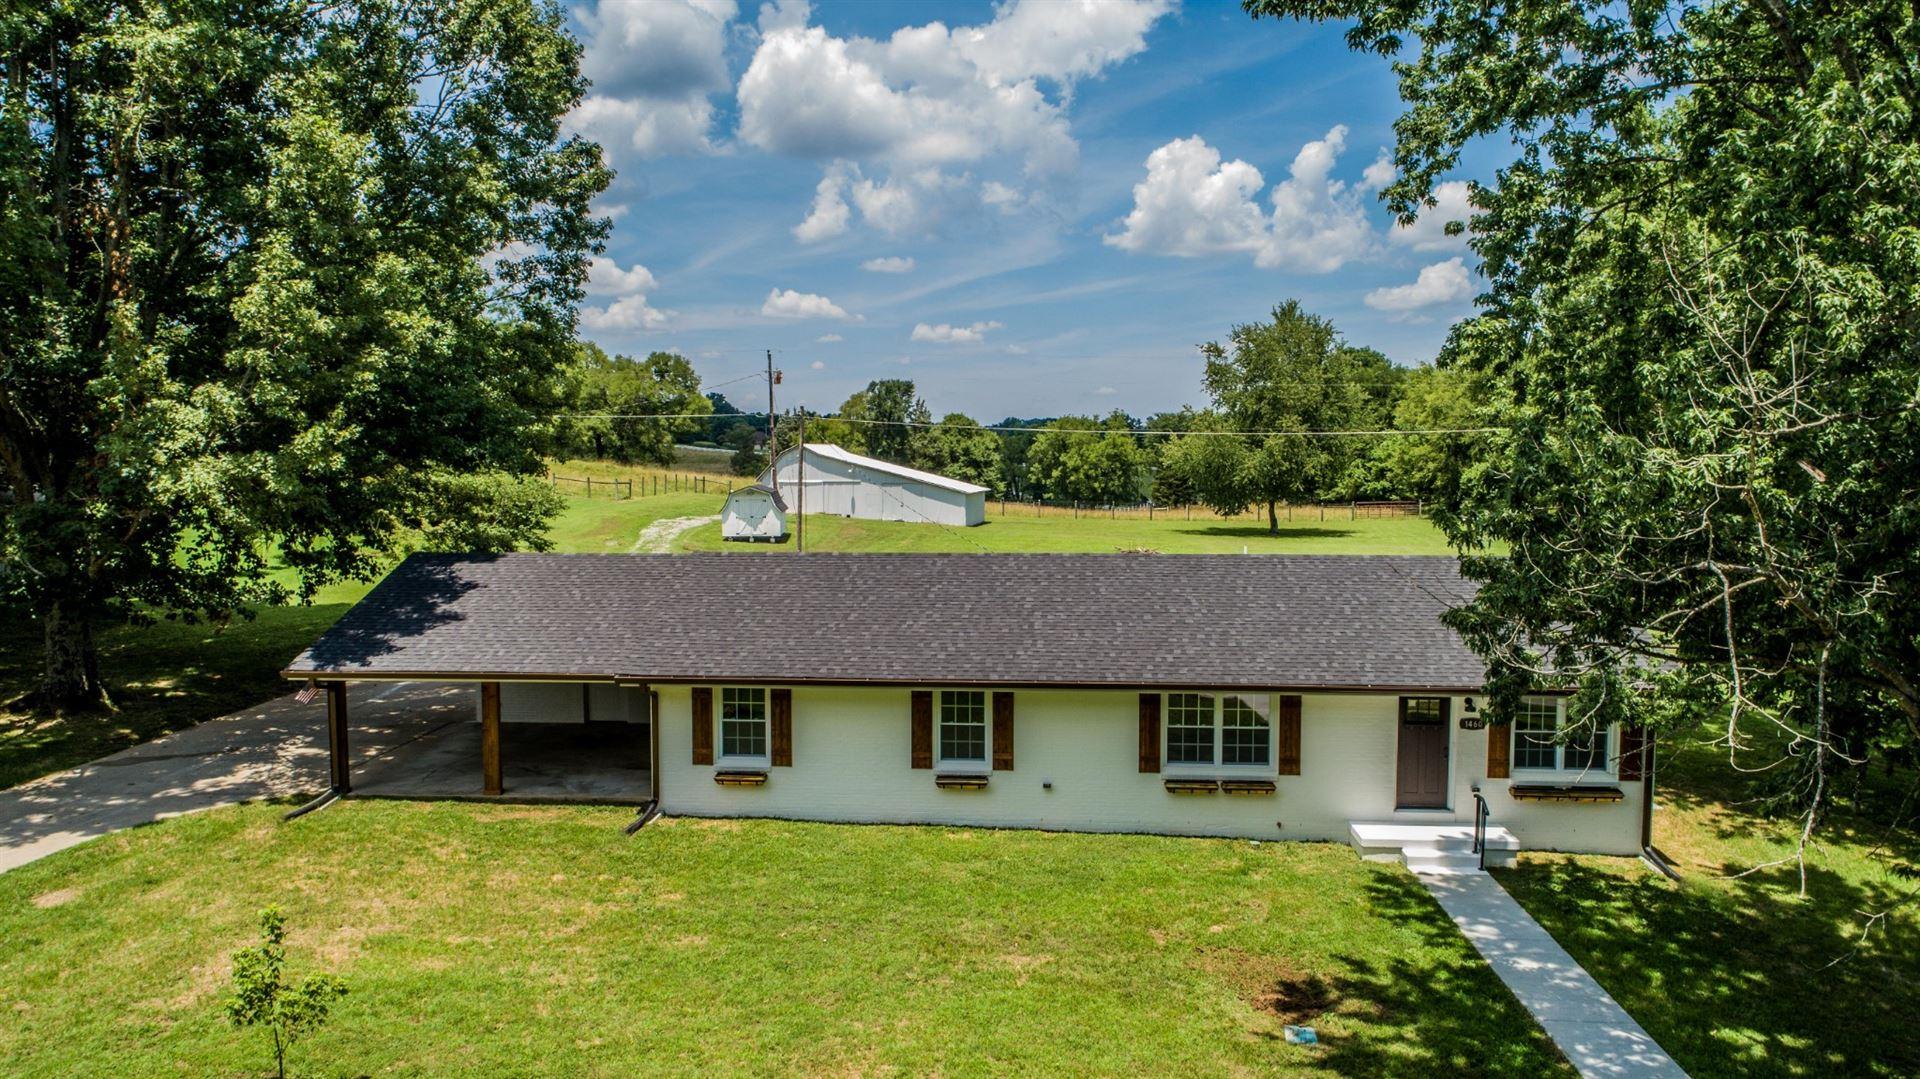 1460 Collins Hollow Rd, Lewisburg, TN 37091 - MLS#: 2167050